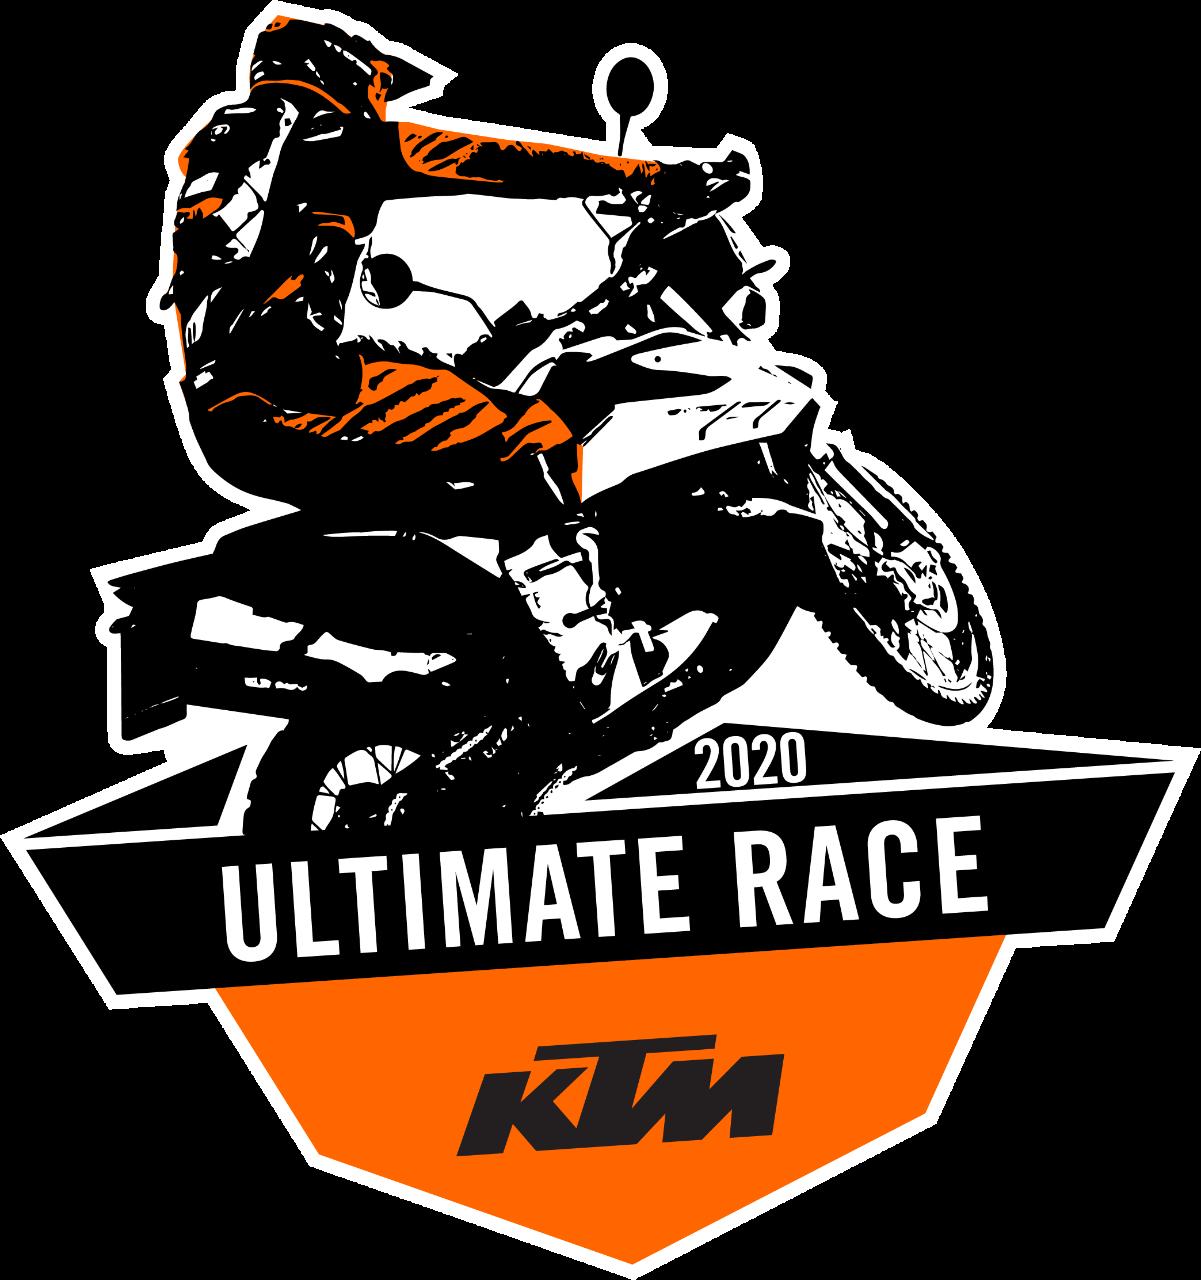 2020 KTM Ultimate Race Qualifications: AUSTRALIA